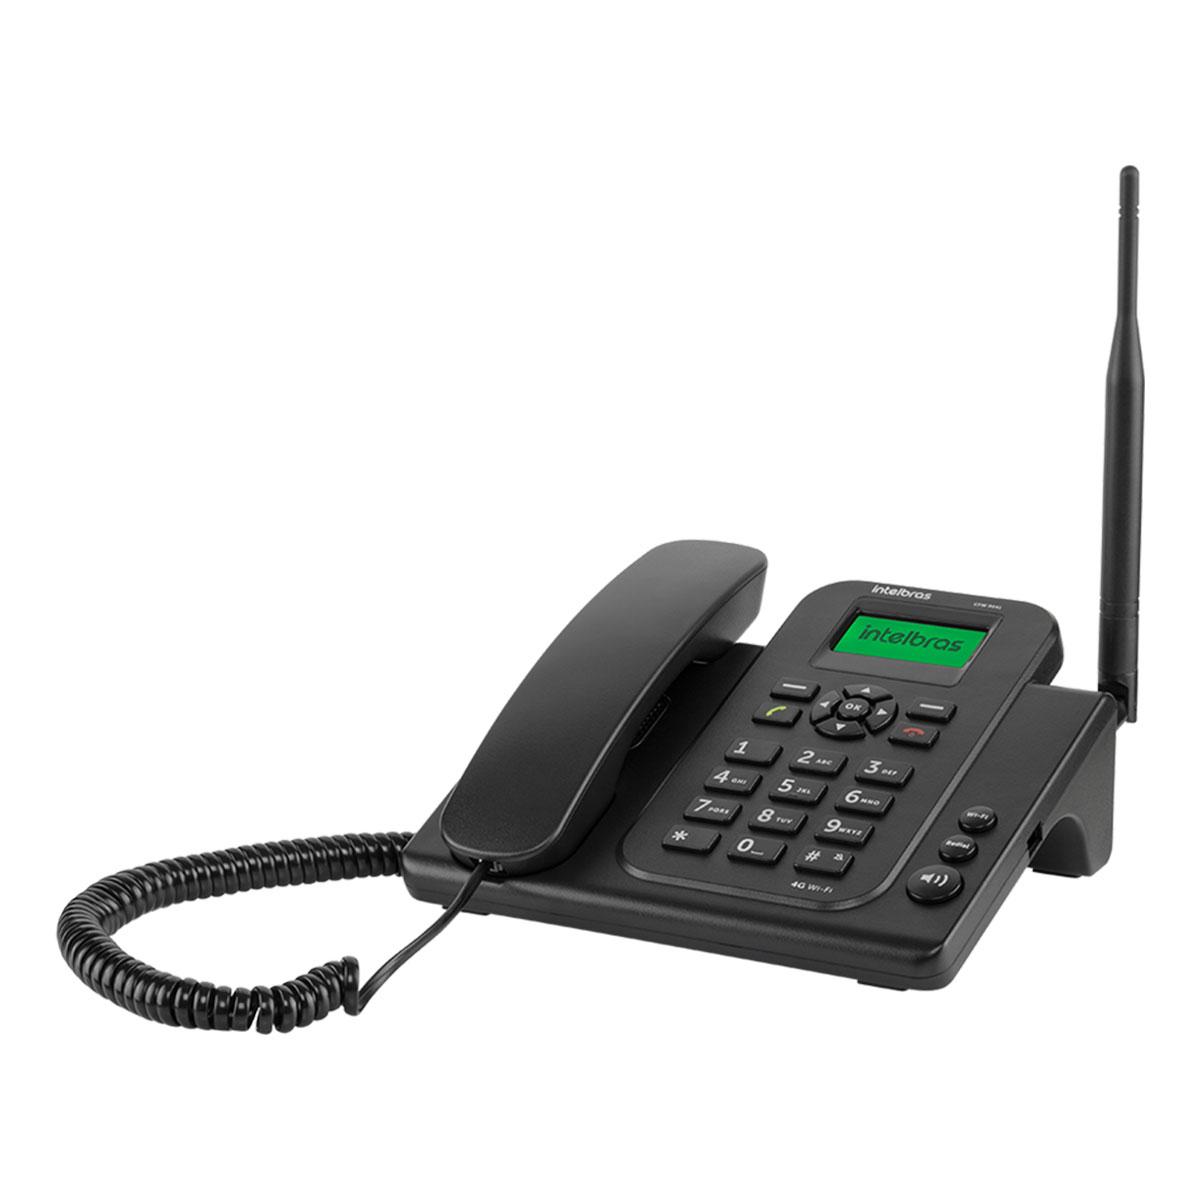 TELEFONE CELULAR FIXO 4G WI-FI CFW 9041 4119041  - Audio Video & cia